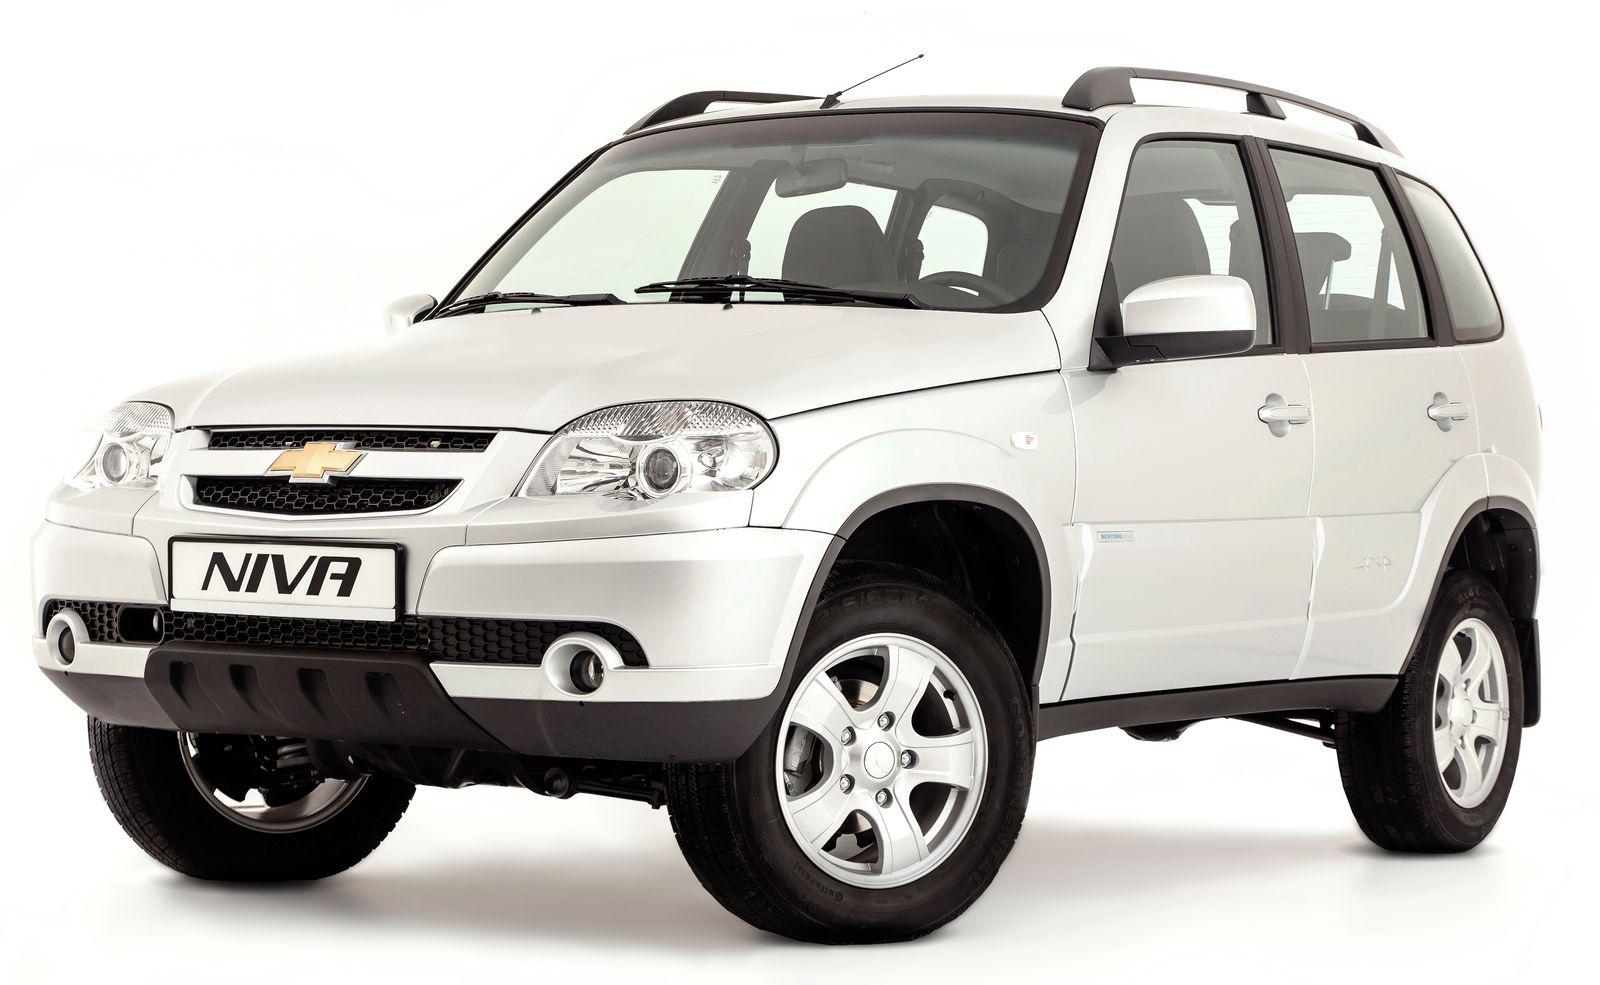 Chevrolet Niva станет тише - журнал За рулем